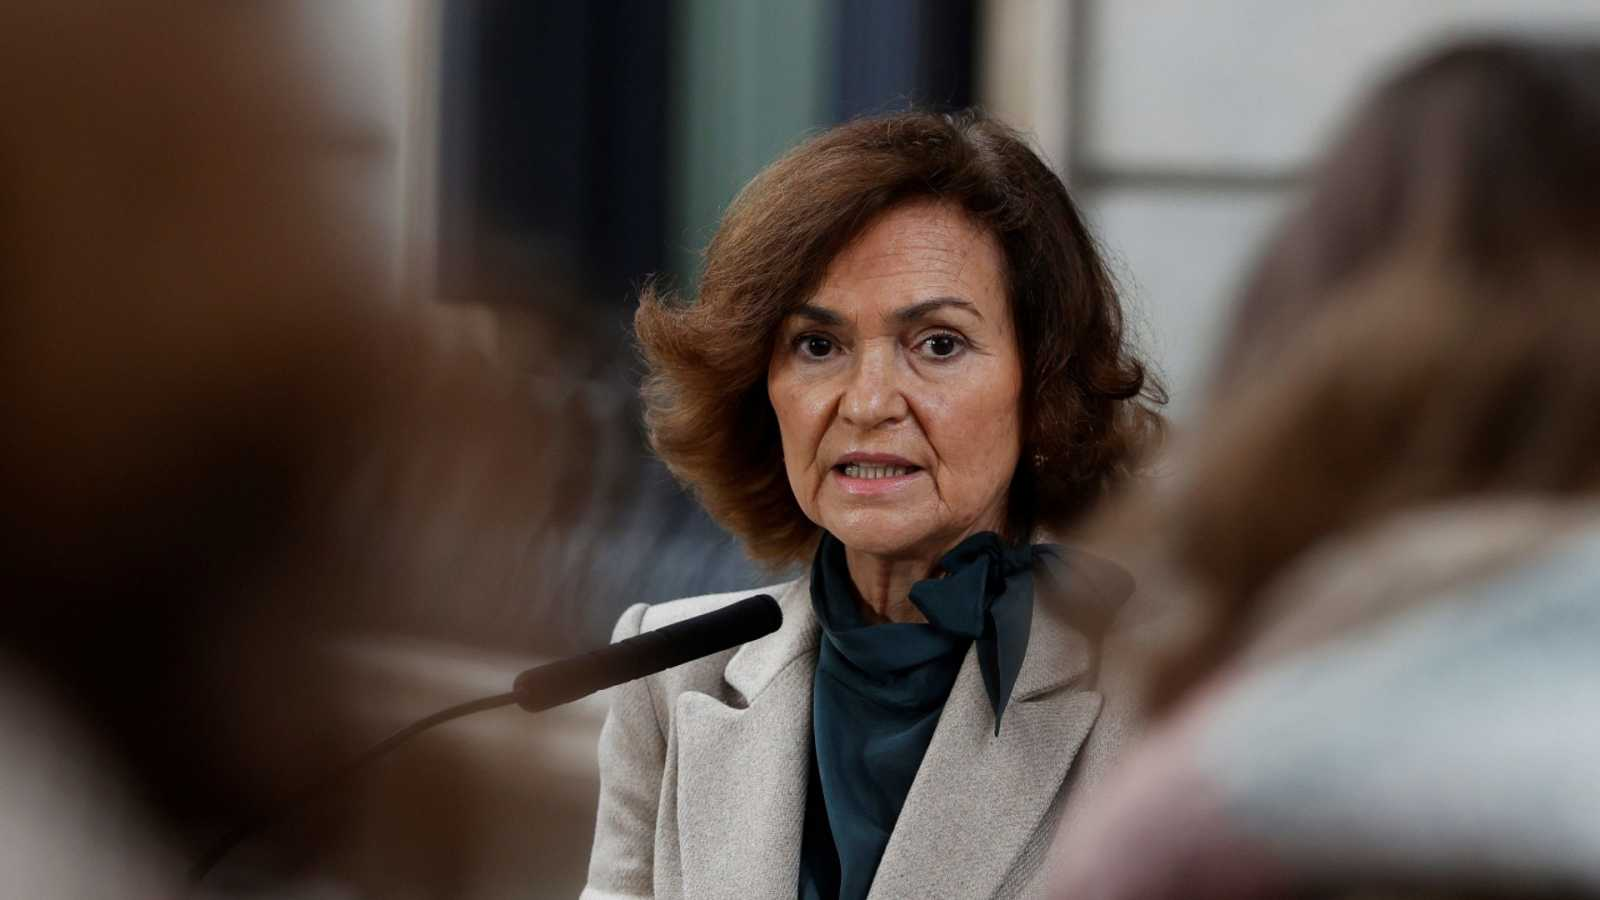 La vicepresidenta segunda del Gobierno, Carmen Calvo.